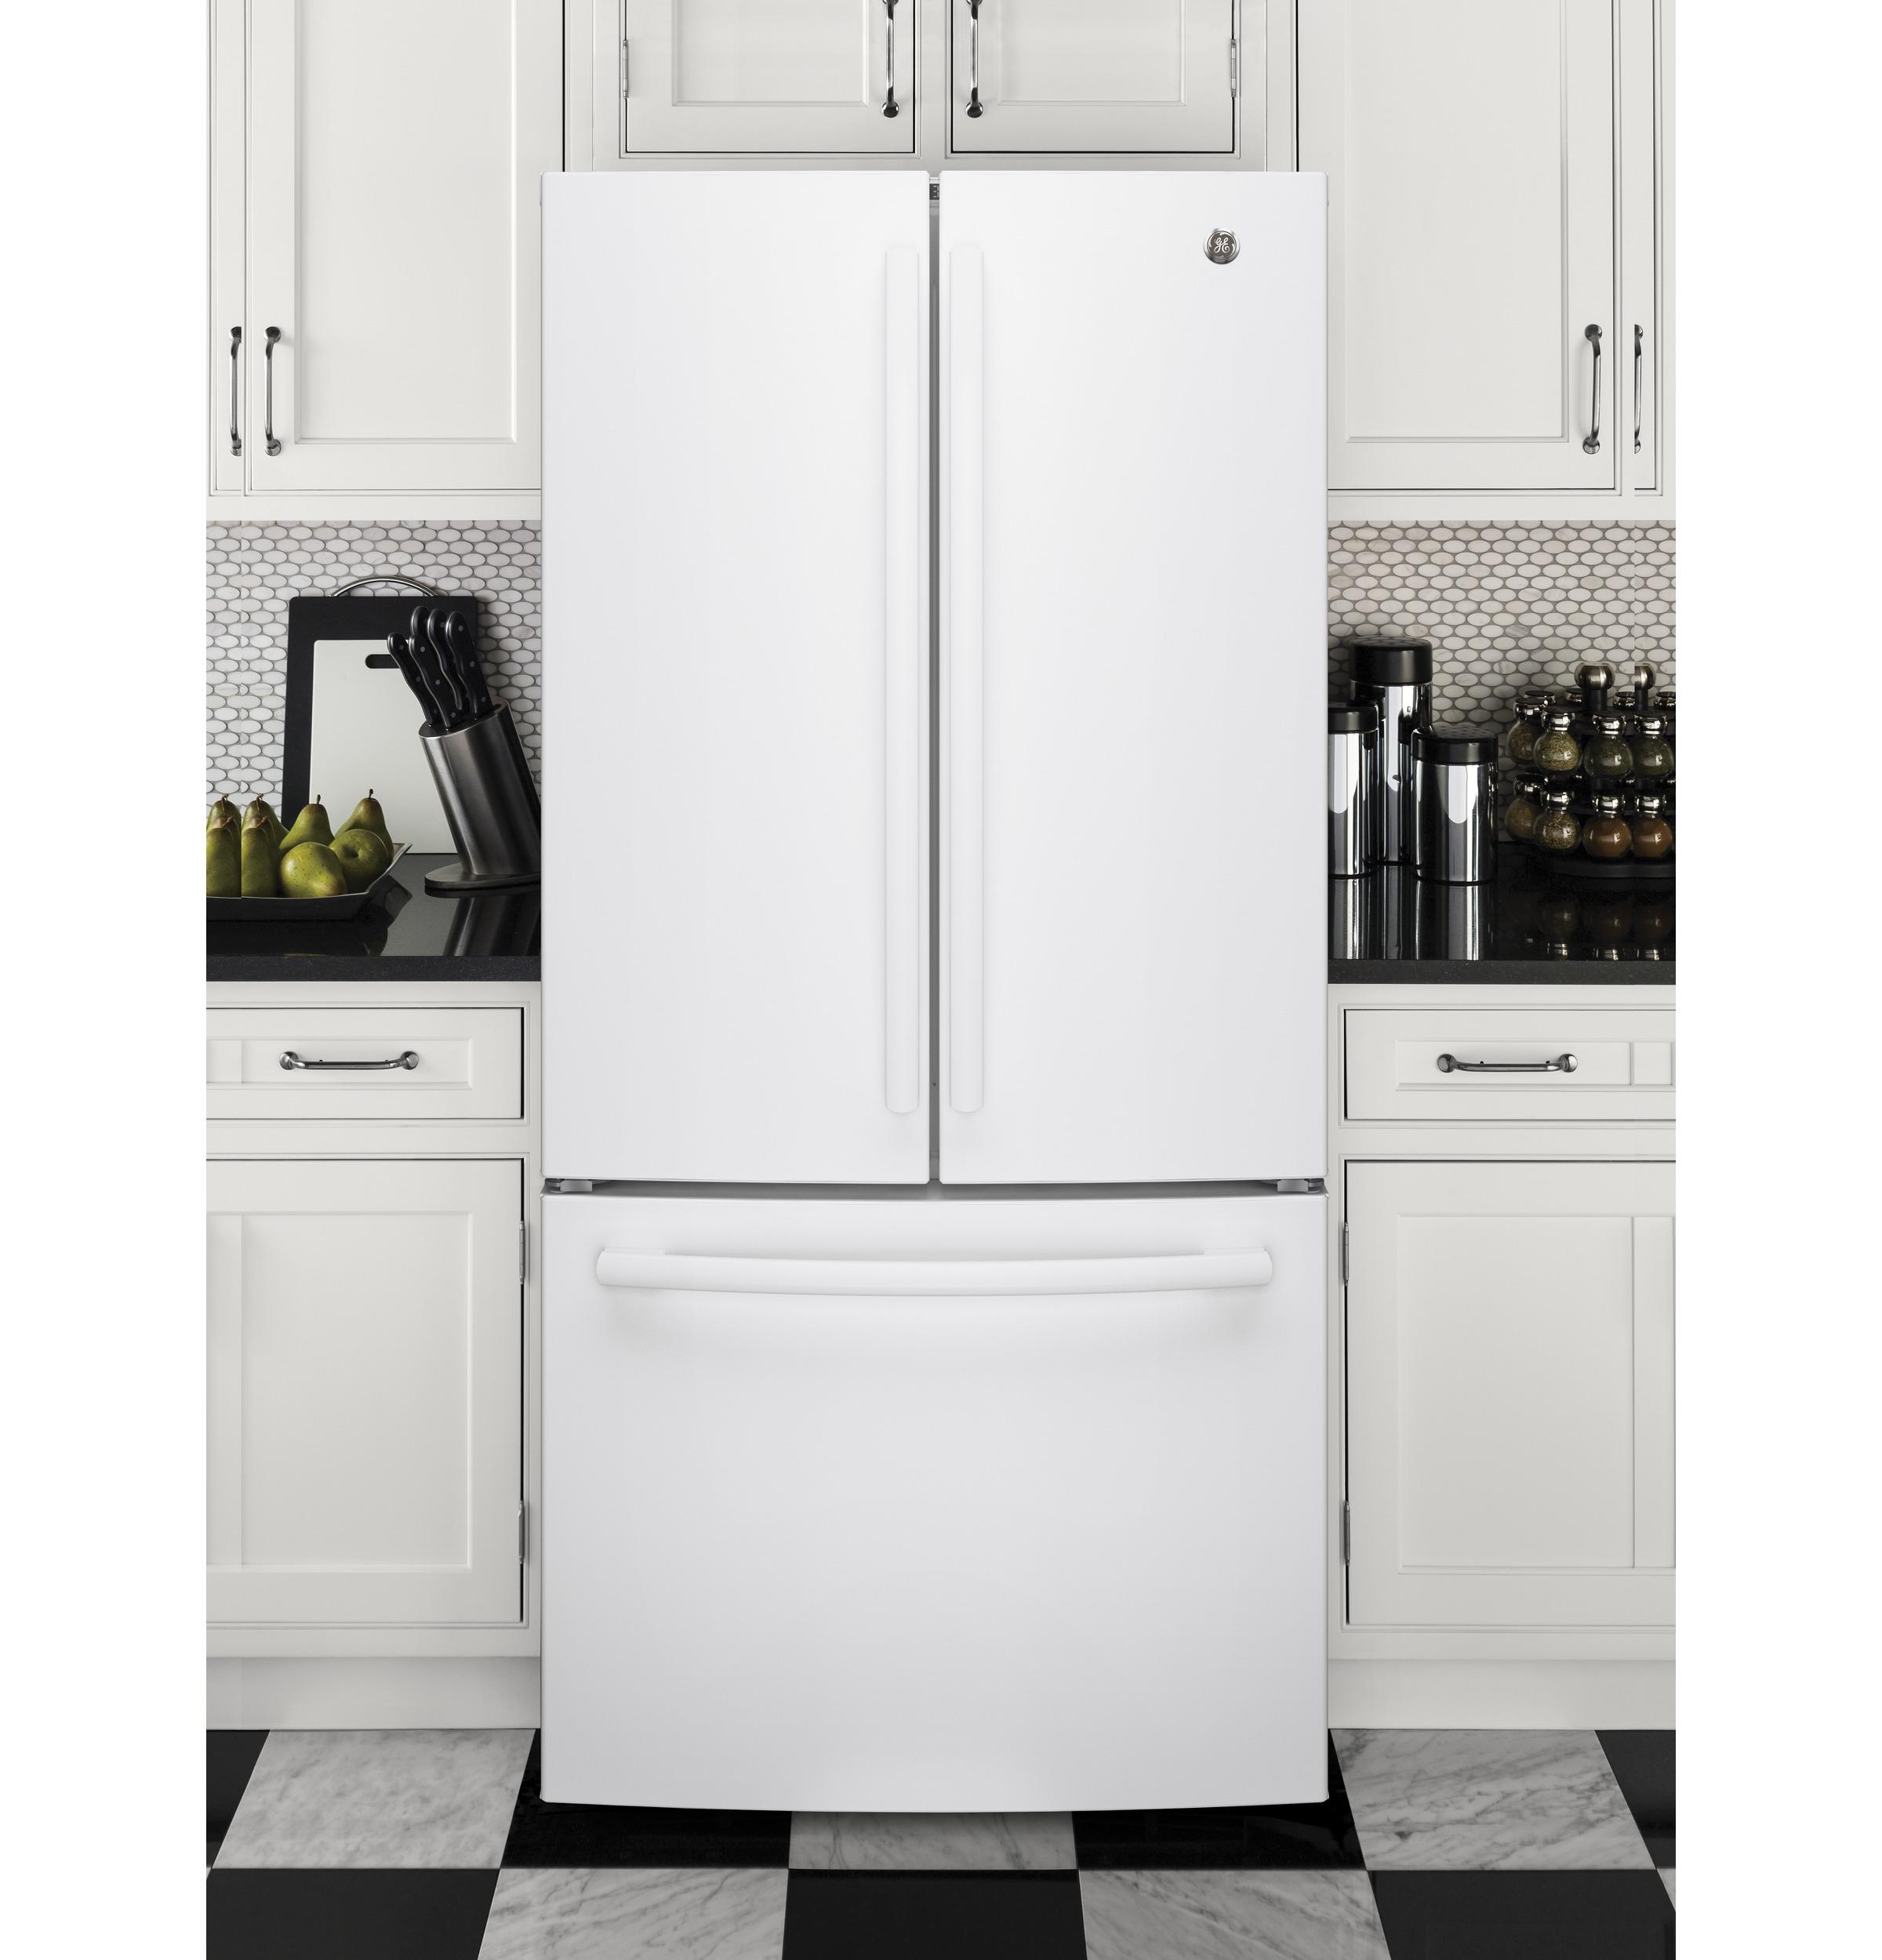 Model: GNE25JGKWW   GE GE® ENERGY STAR® 24.7 Cu. Ft. French-Door Refrigerator